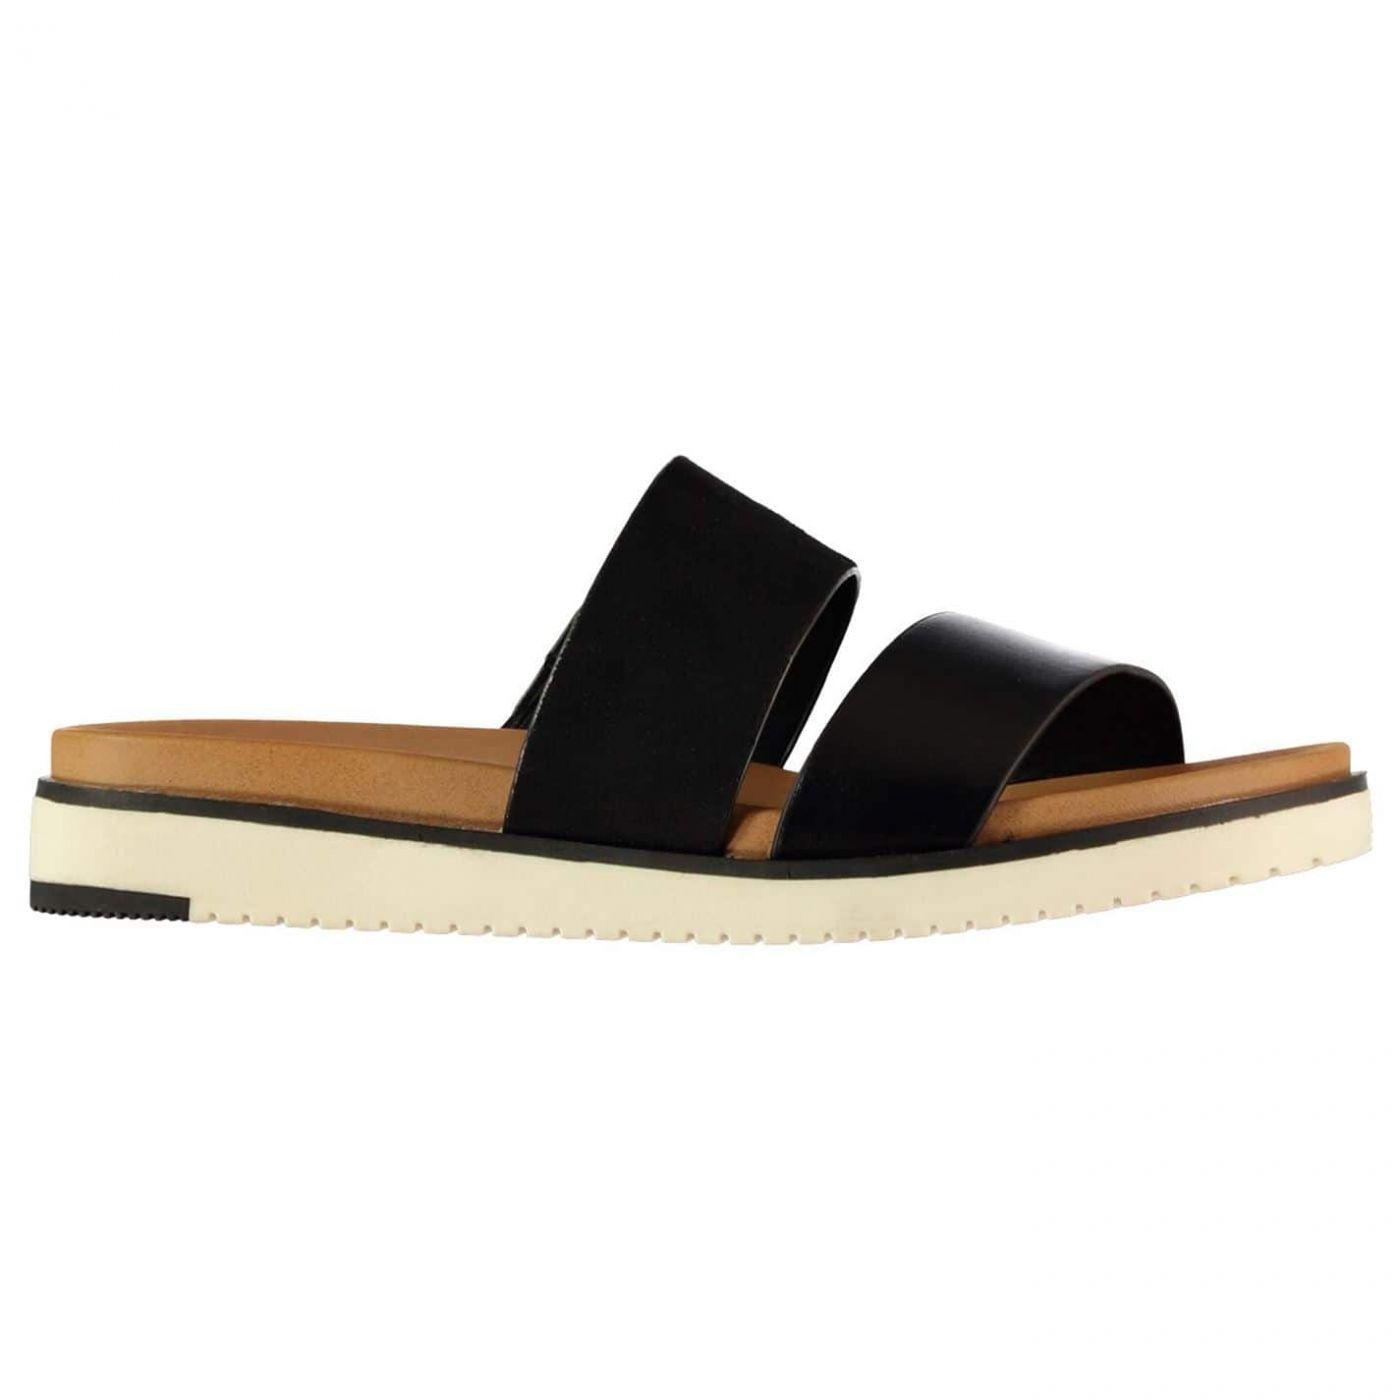 Aldo Kestell Flat Sandals Ladies